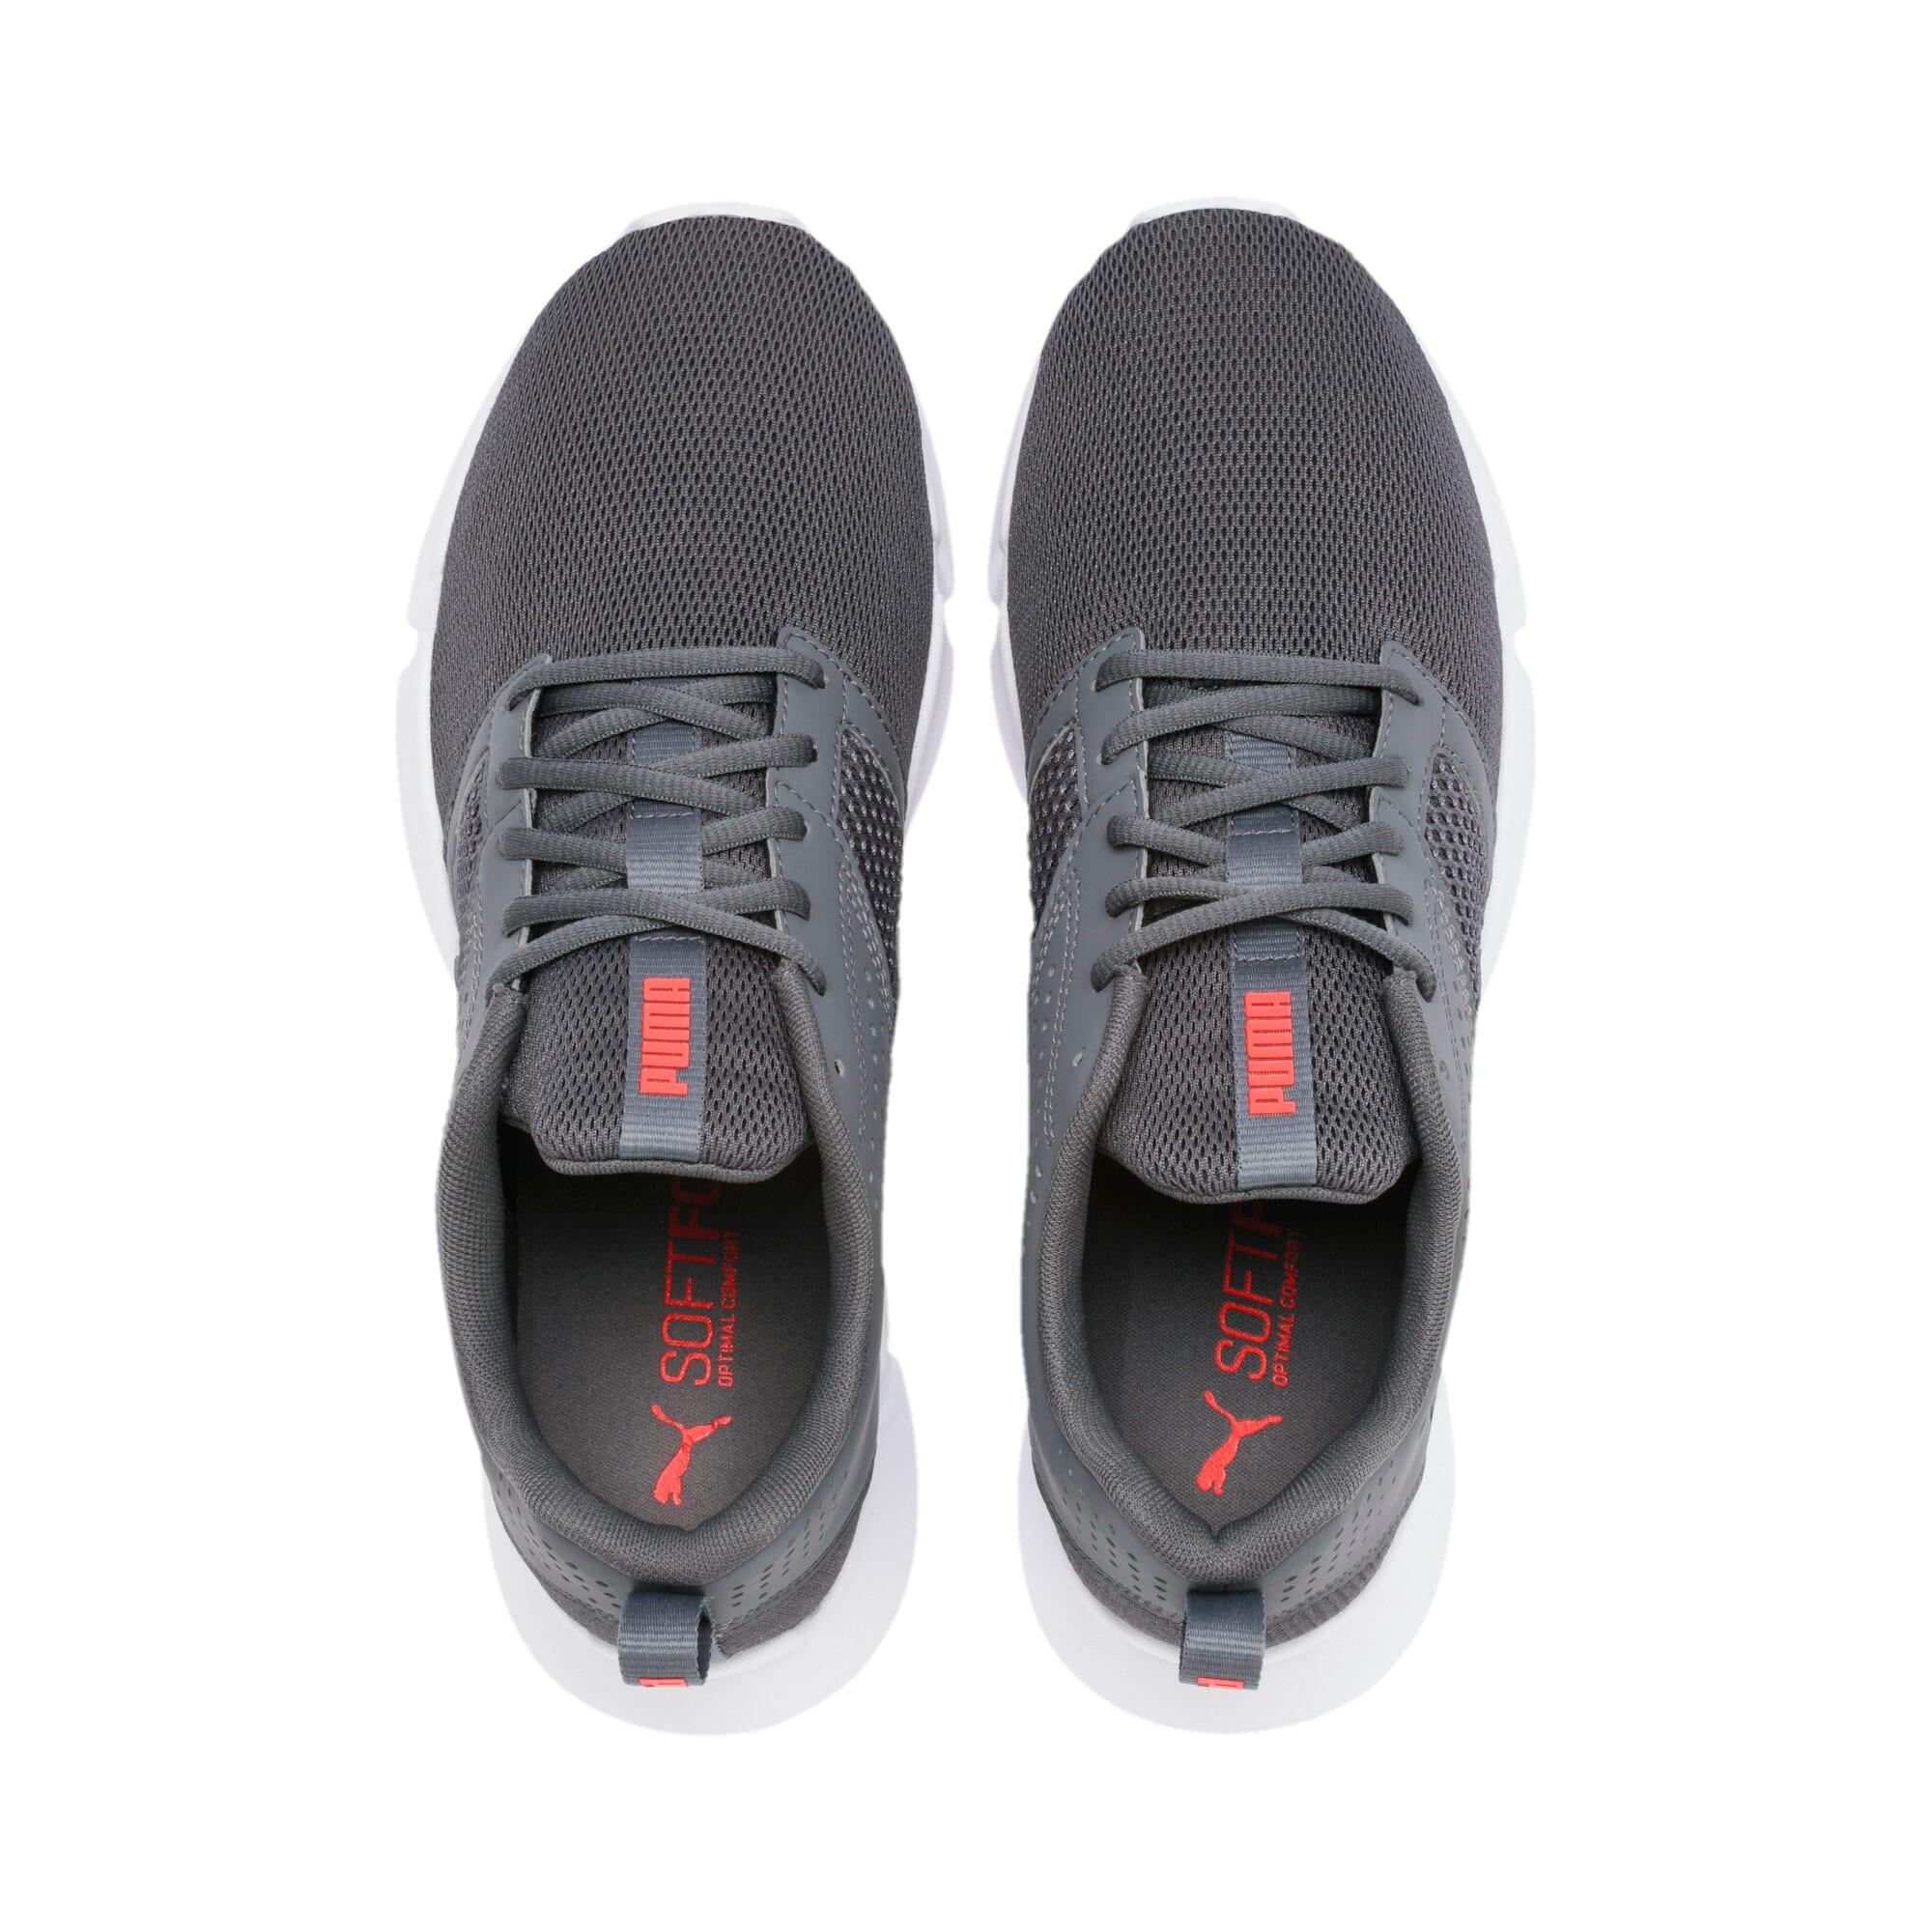 Thumbnail 4 of INTERFLEX Modern Running Shoes, CASTLEROCK-Black-Nrgy Red, medium-IND